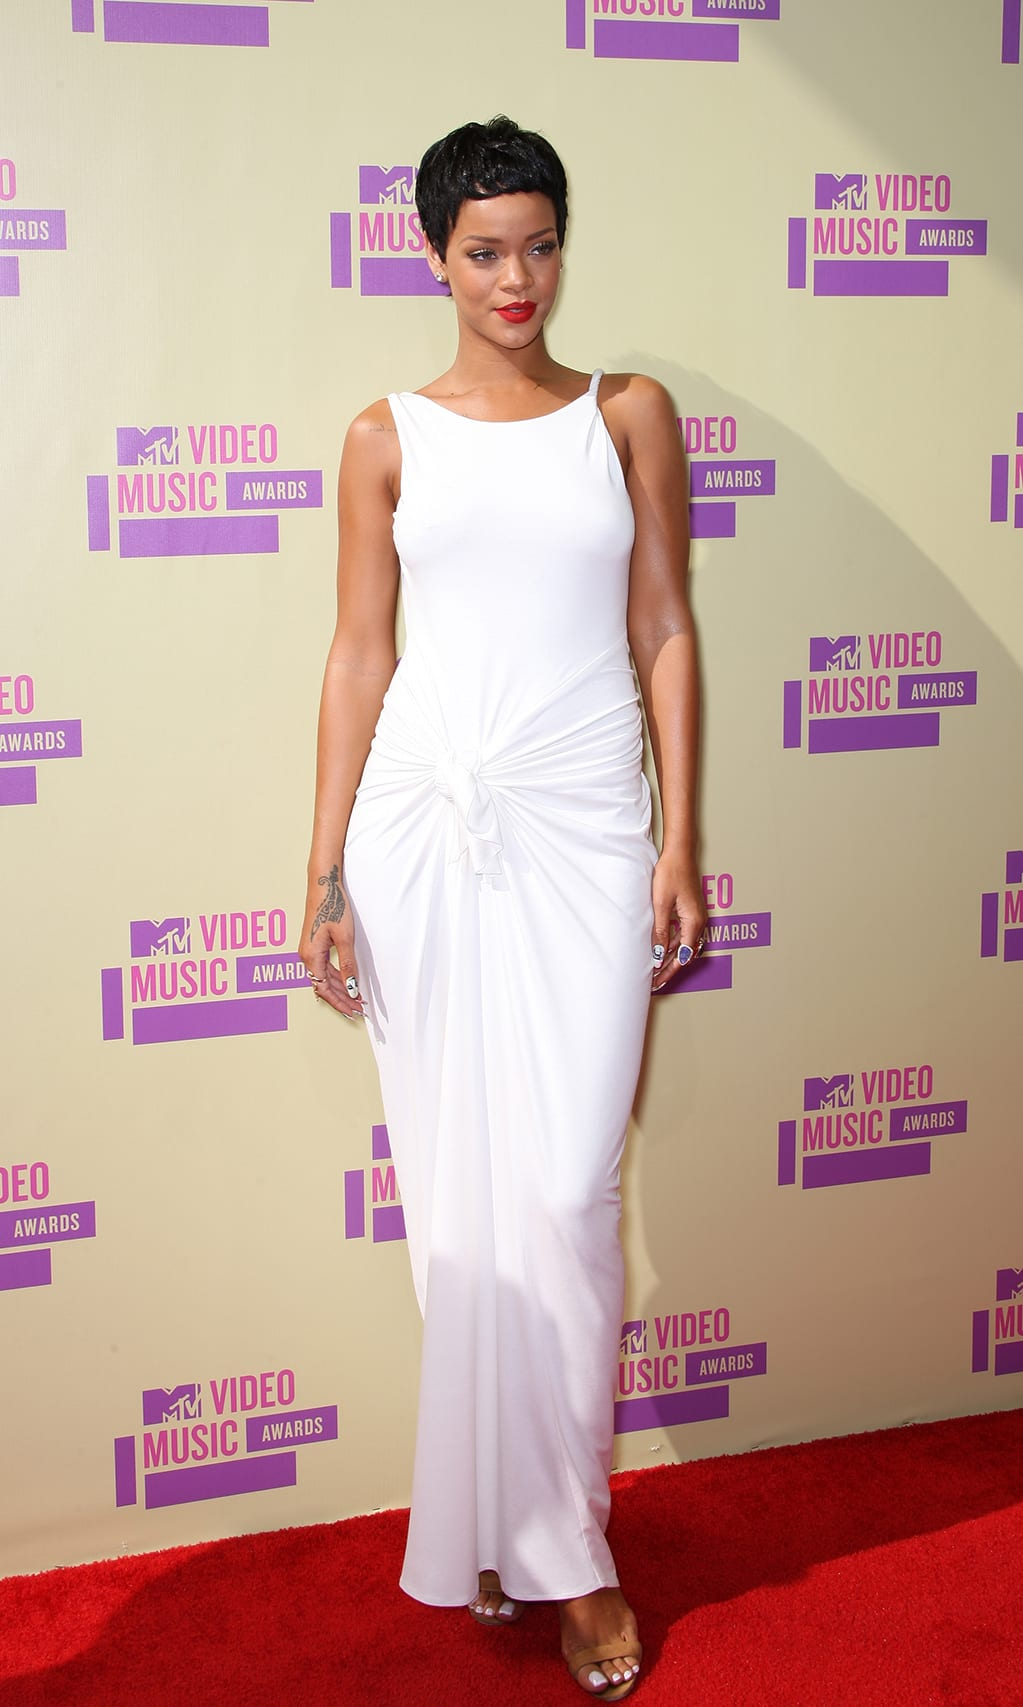 2e359c52dc Rihanna arrived at the 2012 MTV Video Music Awards on Sept. 6